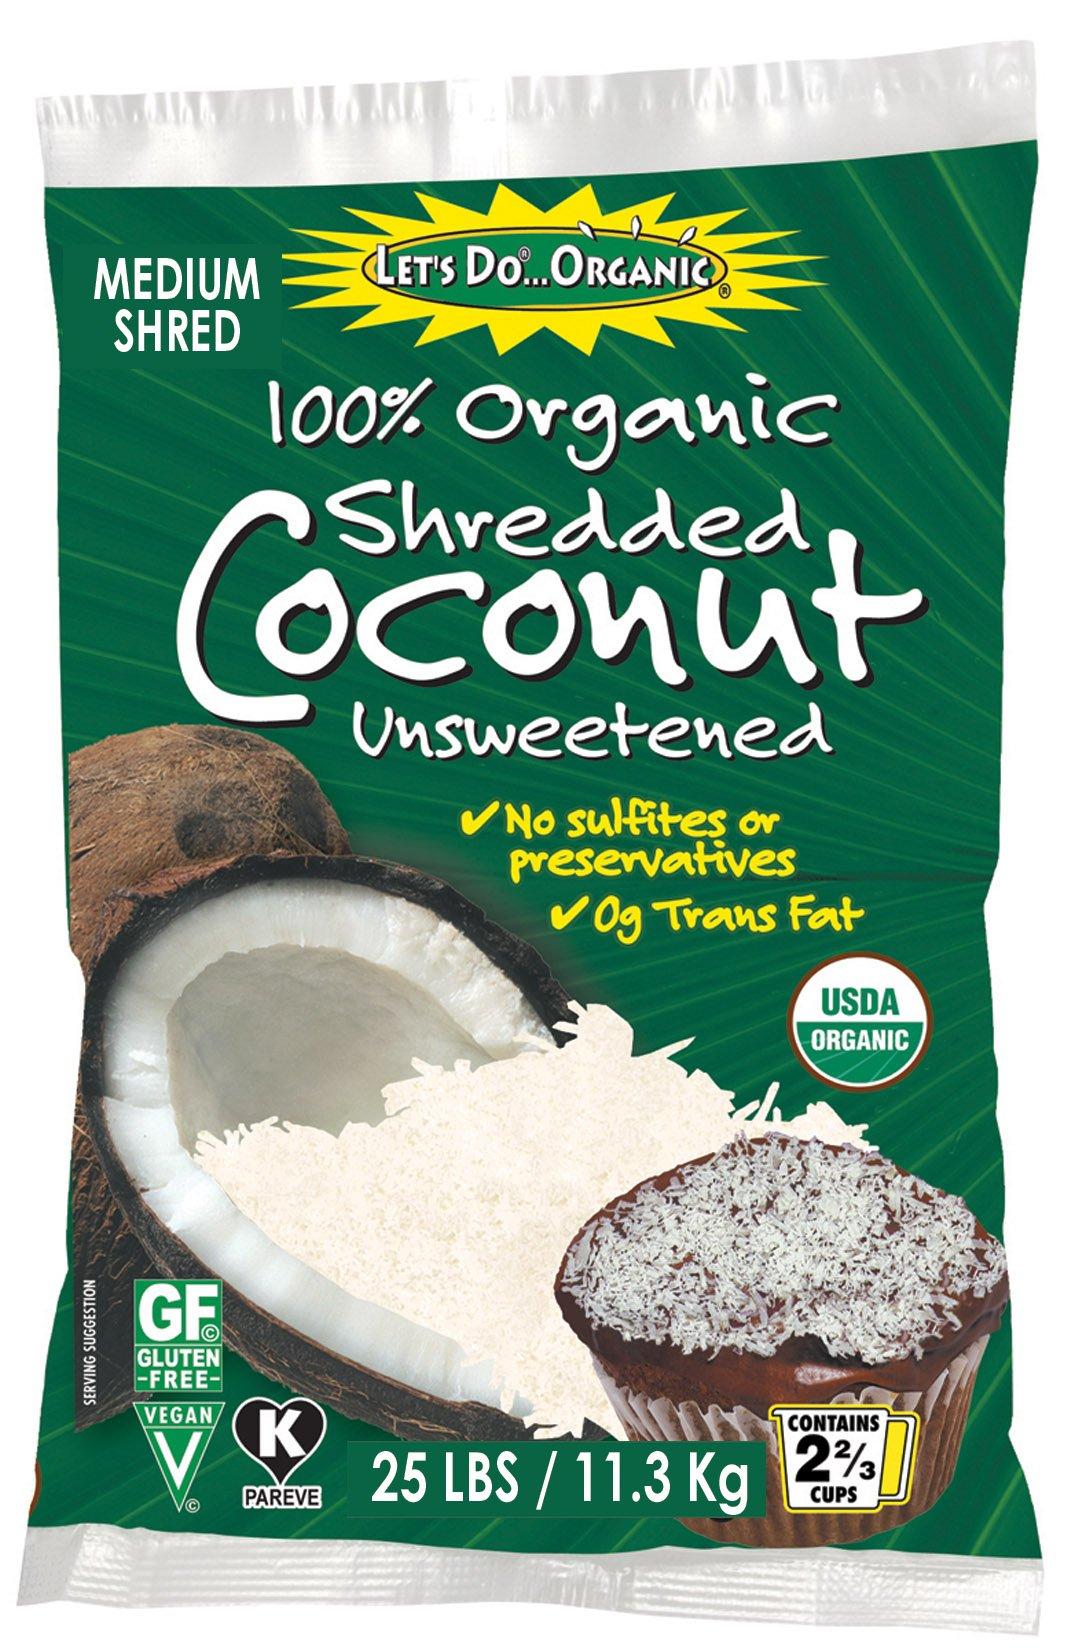 Let's Do Organic Shredded Coconut, Medium Shred, Food Service Size, 25 Pound